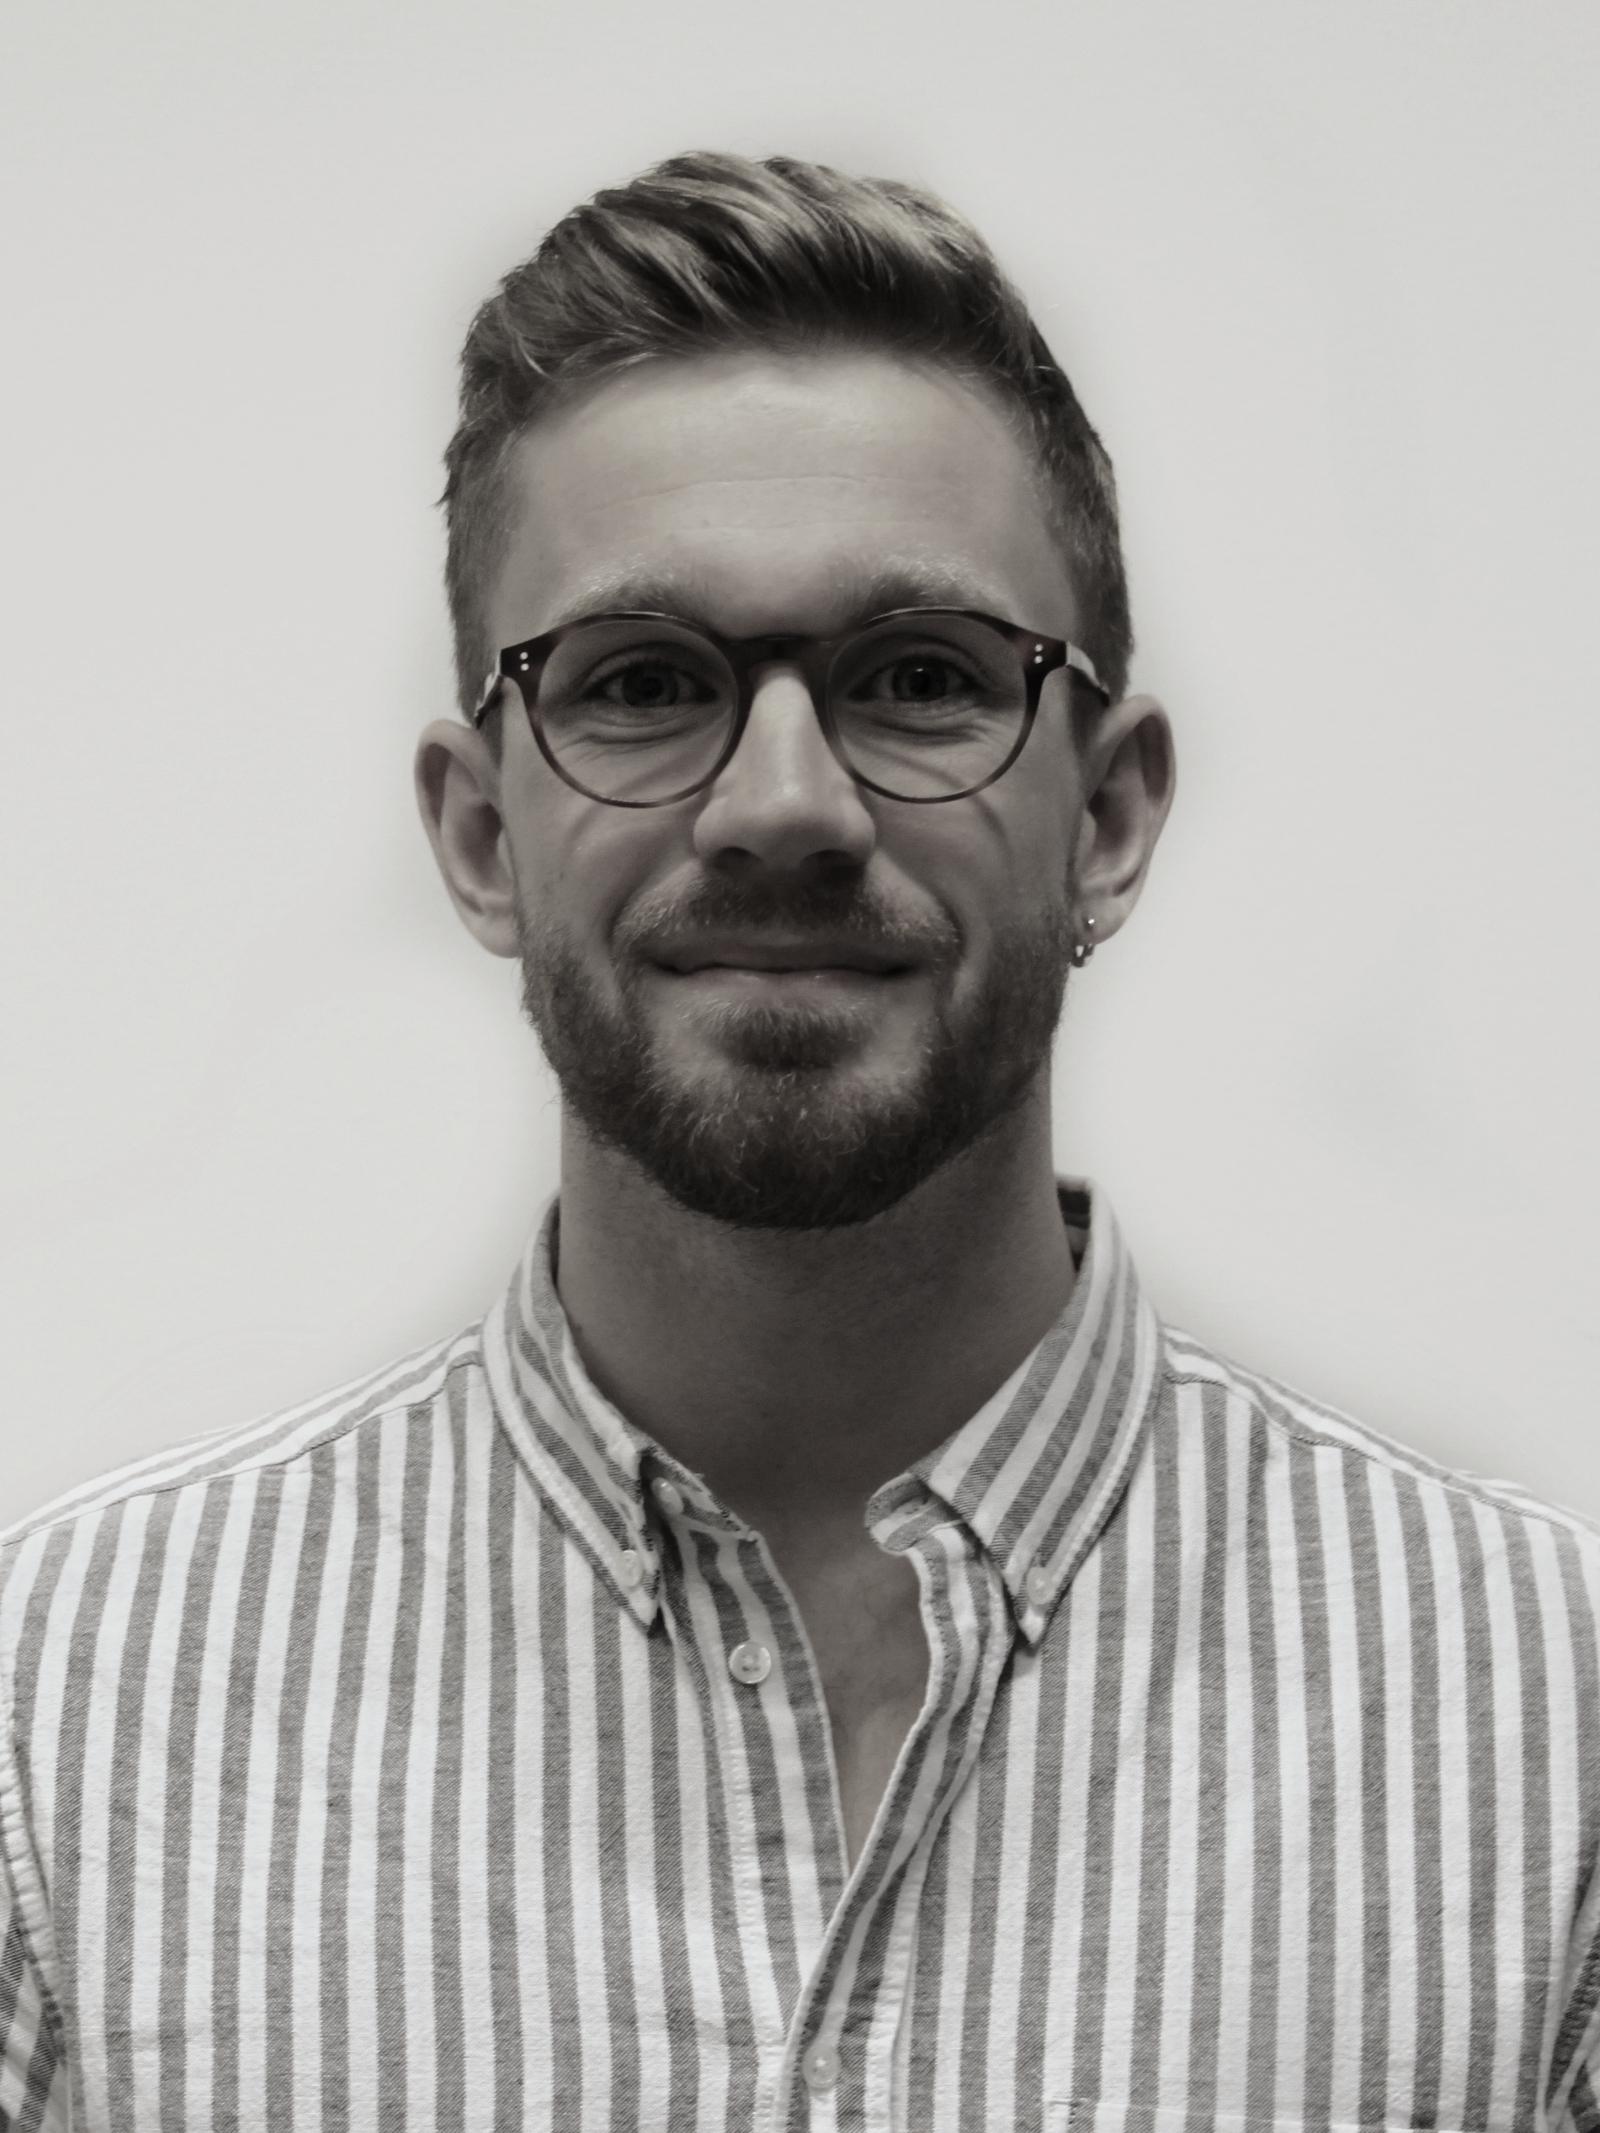 Michael Olschansky Larsen